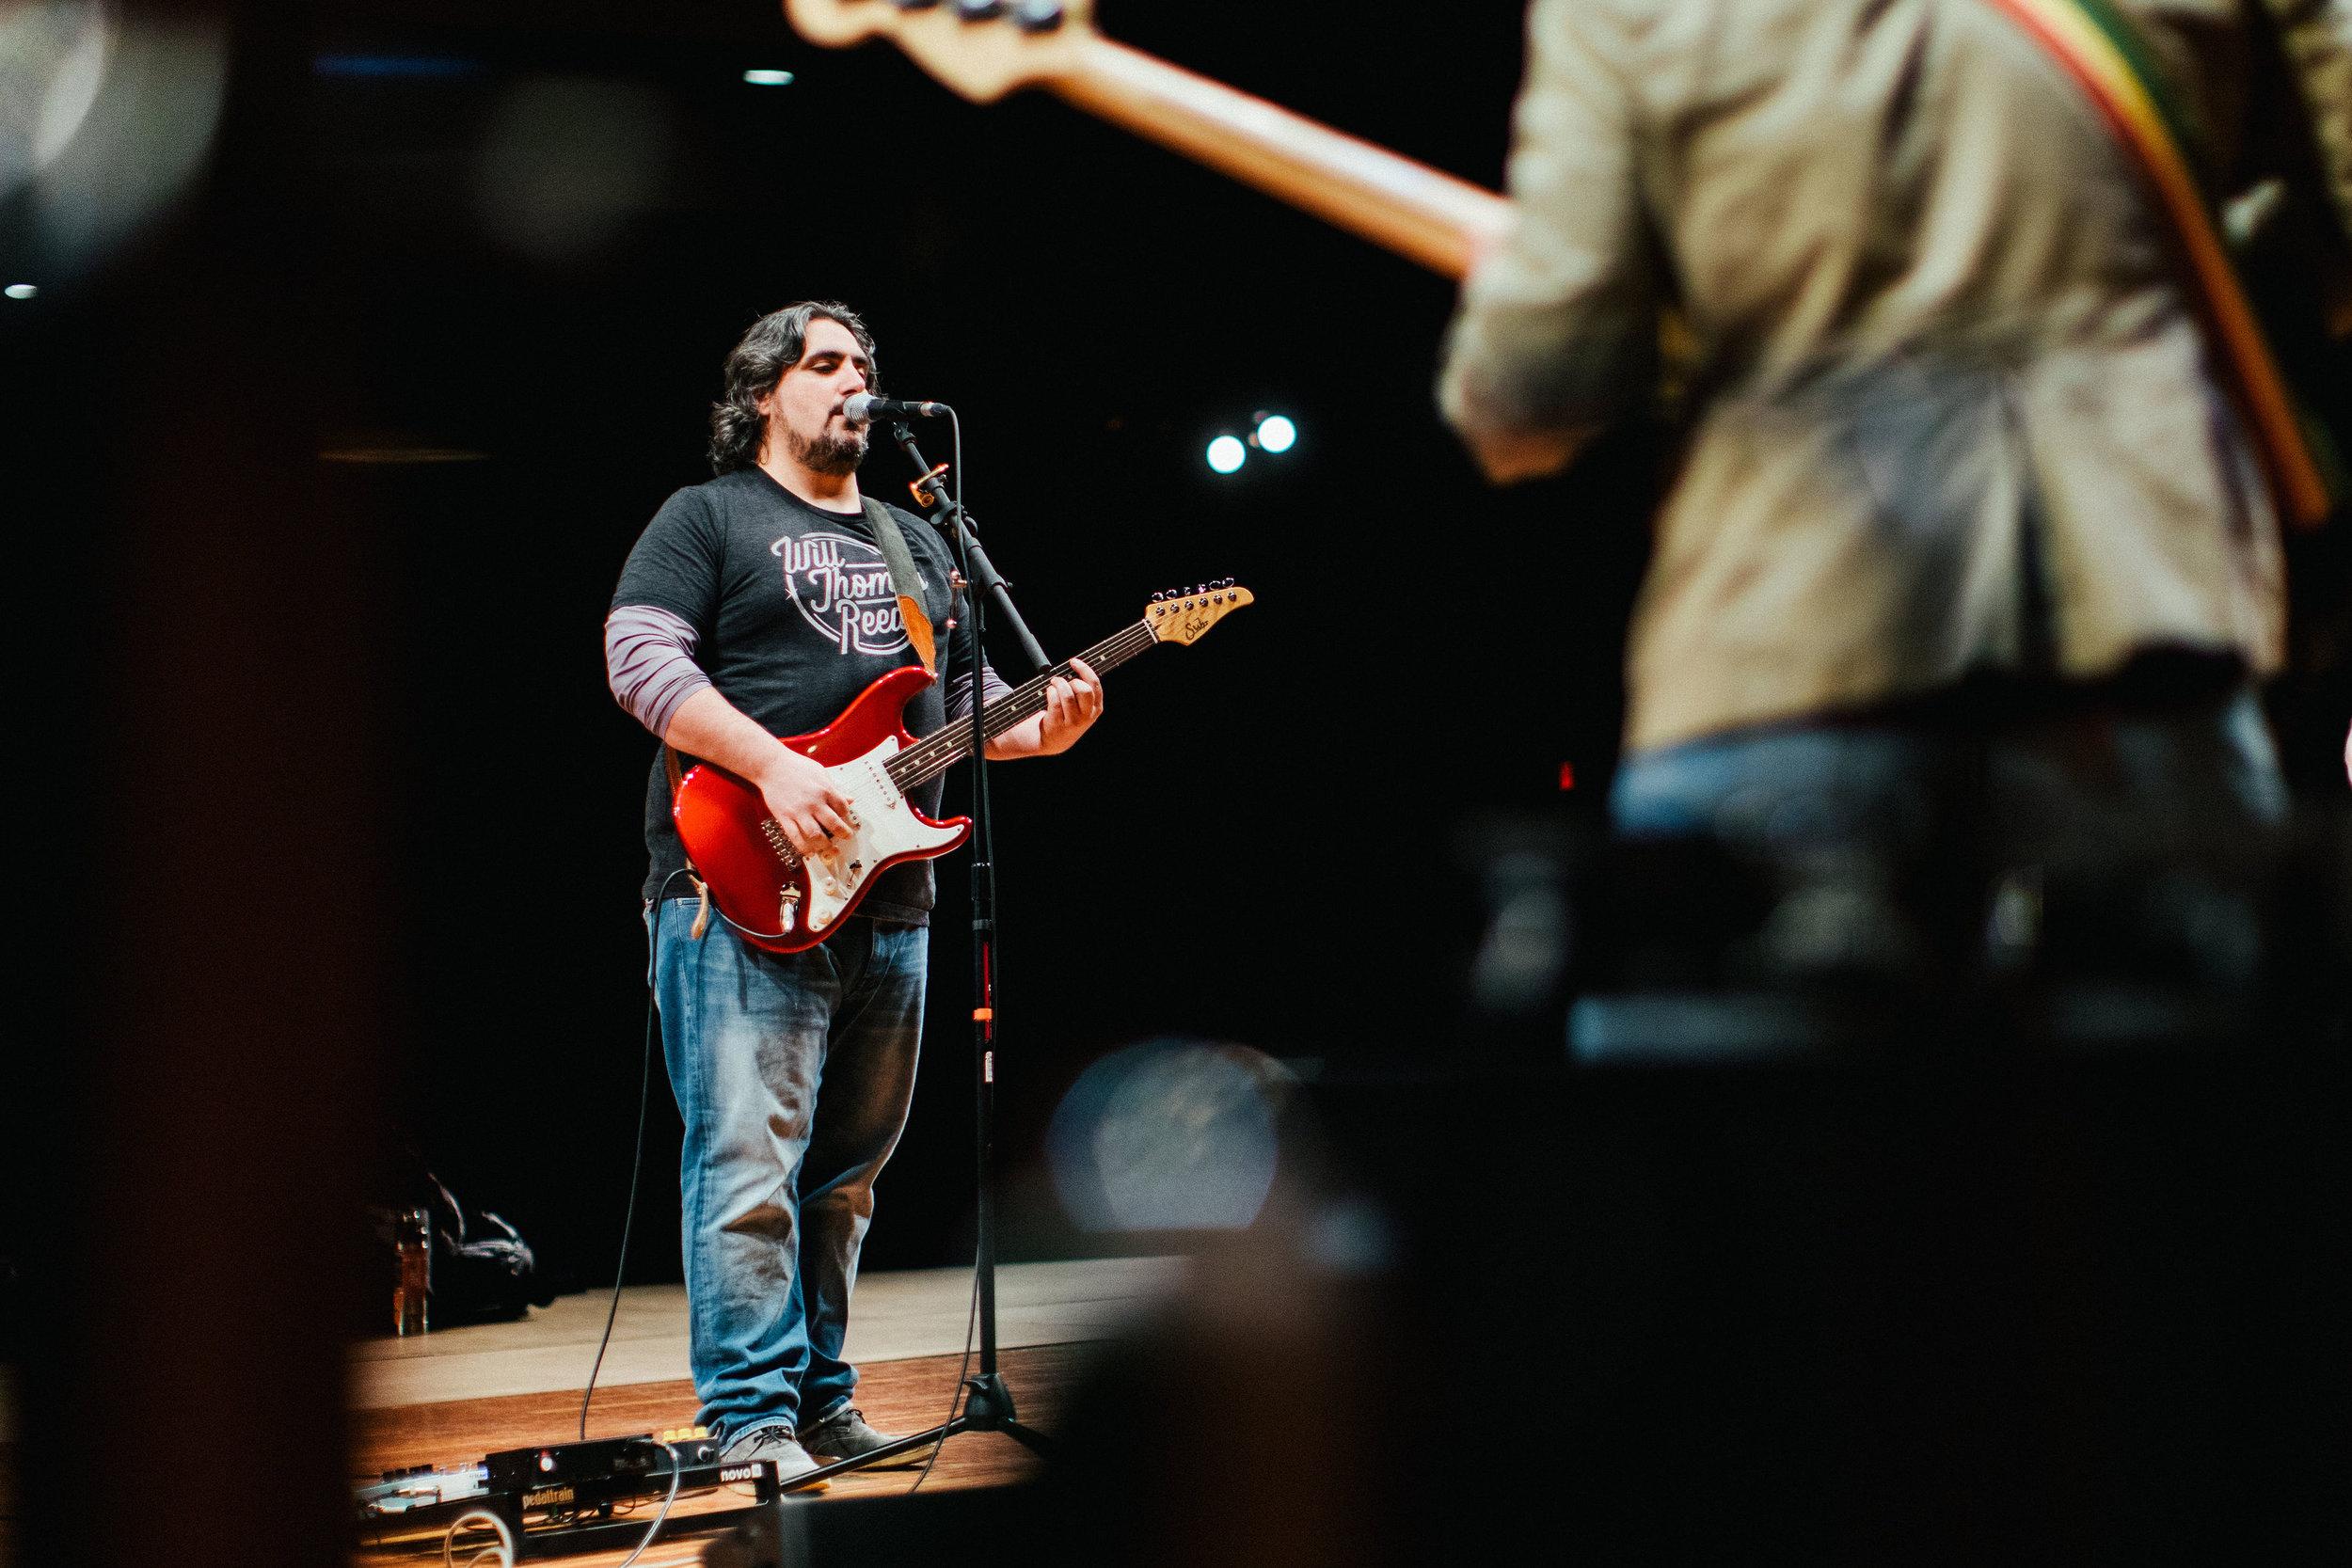 Tony LaRocco, Vocals and Guitars